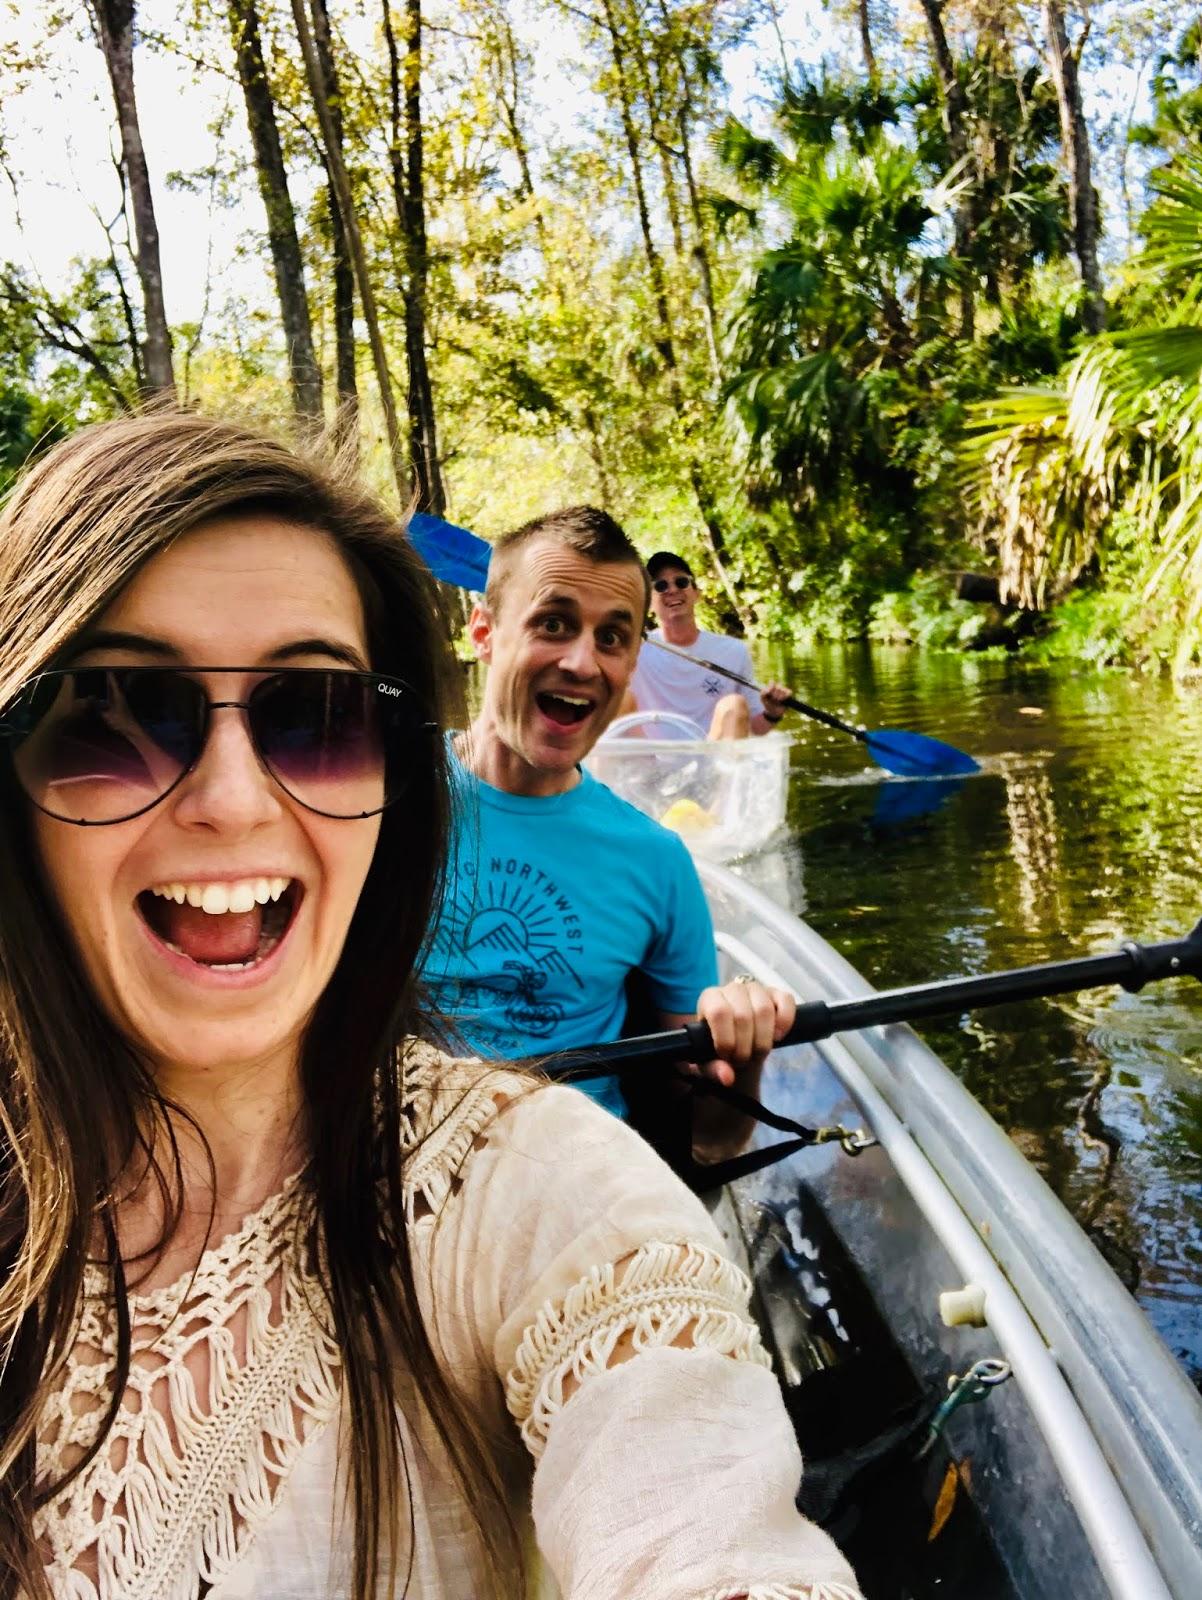 get up and go kayaking, kayaking, clear water, crystal clear water, clear kayak tours, tours in orlando, orlando adventures, orlando, florida, florida adventures, outdoors, clear water kayaking,